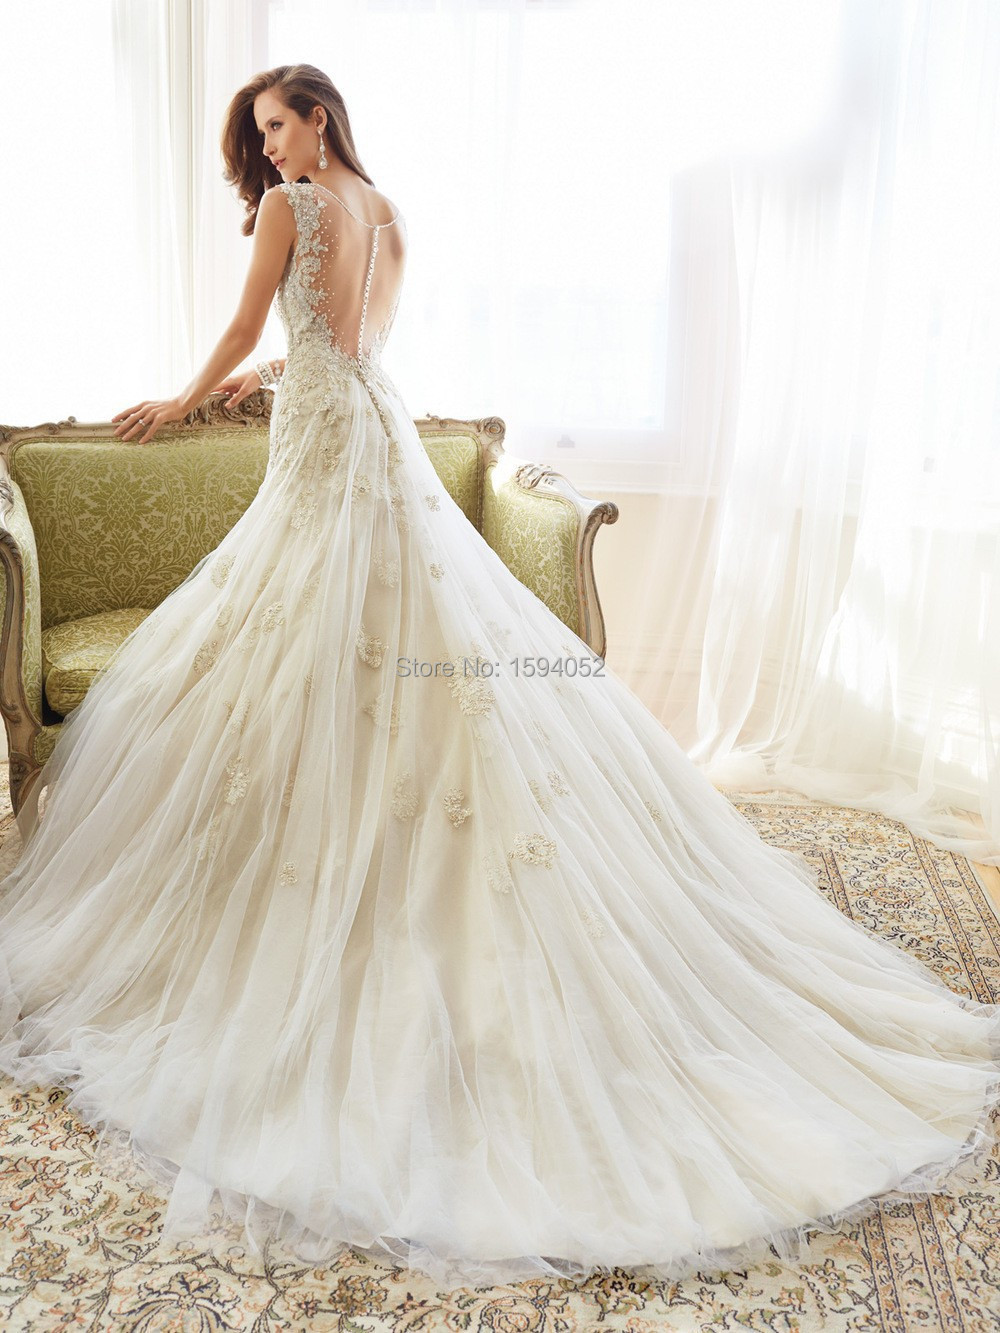 andersonsbride bride wedding dress wedding gown Alaska